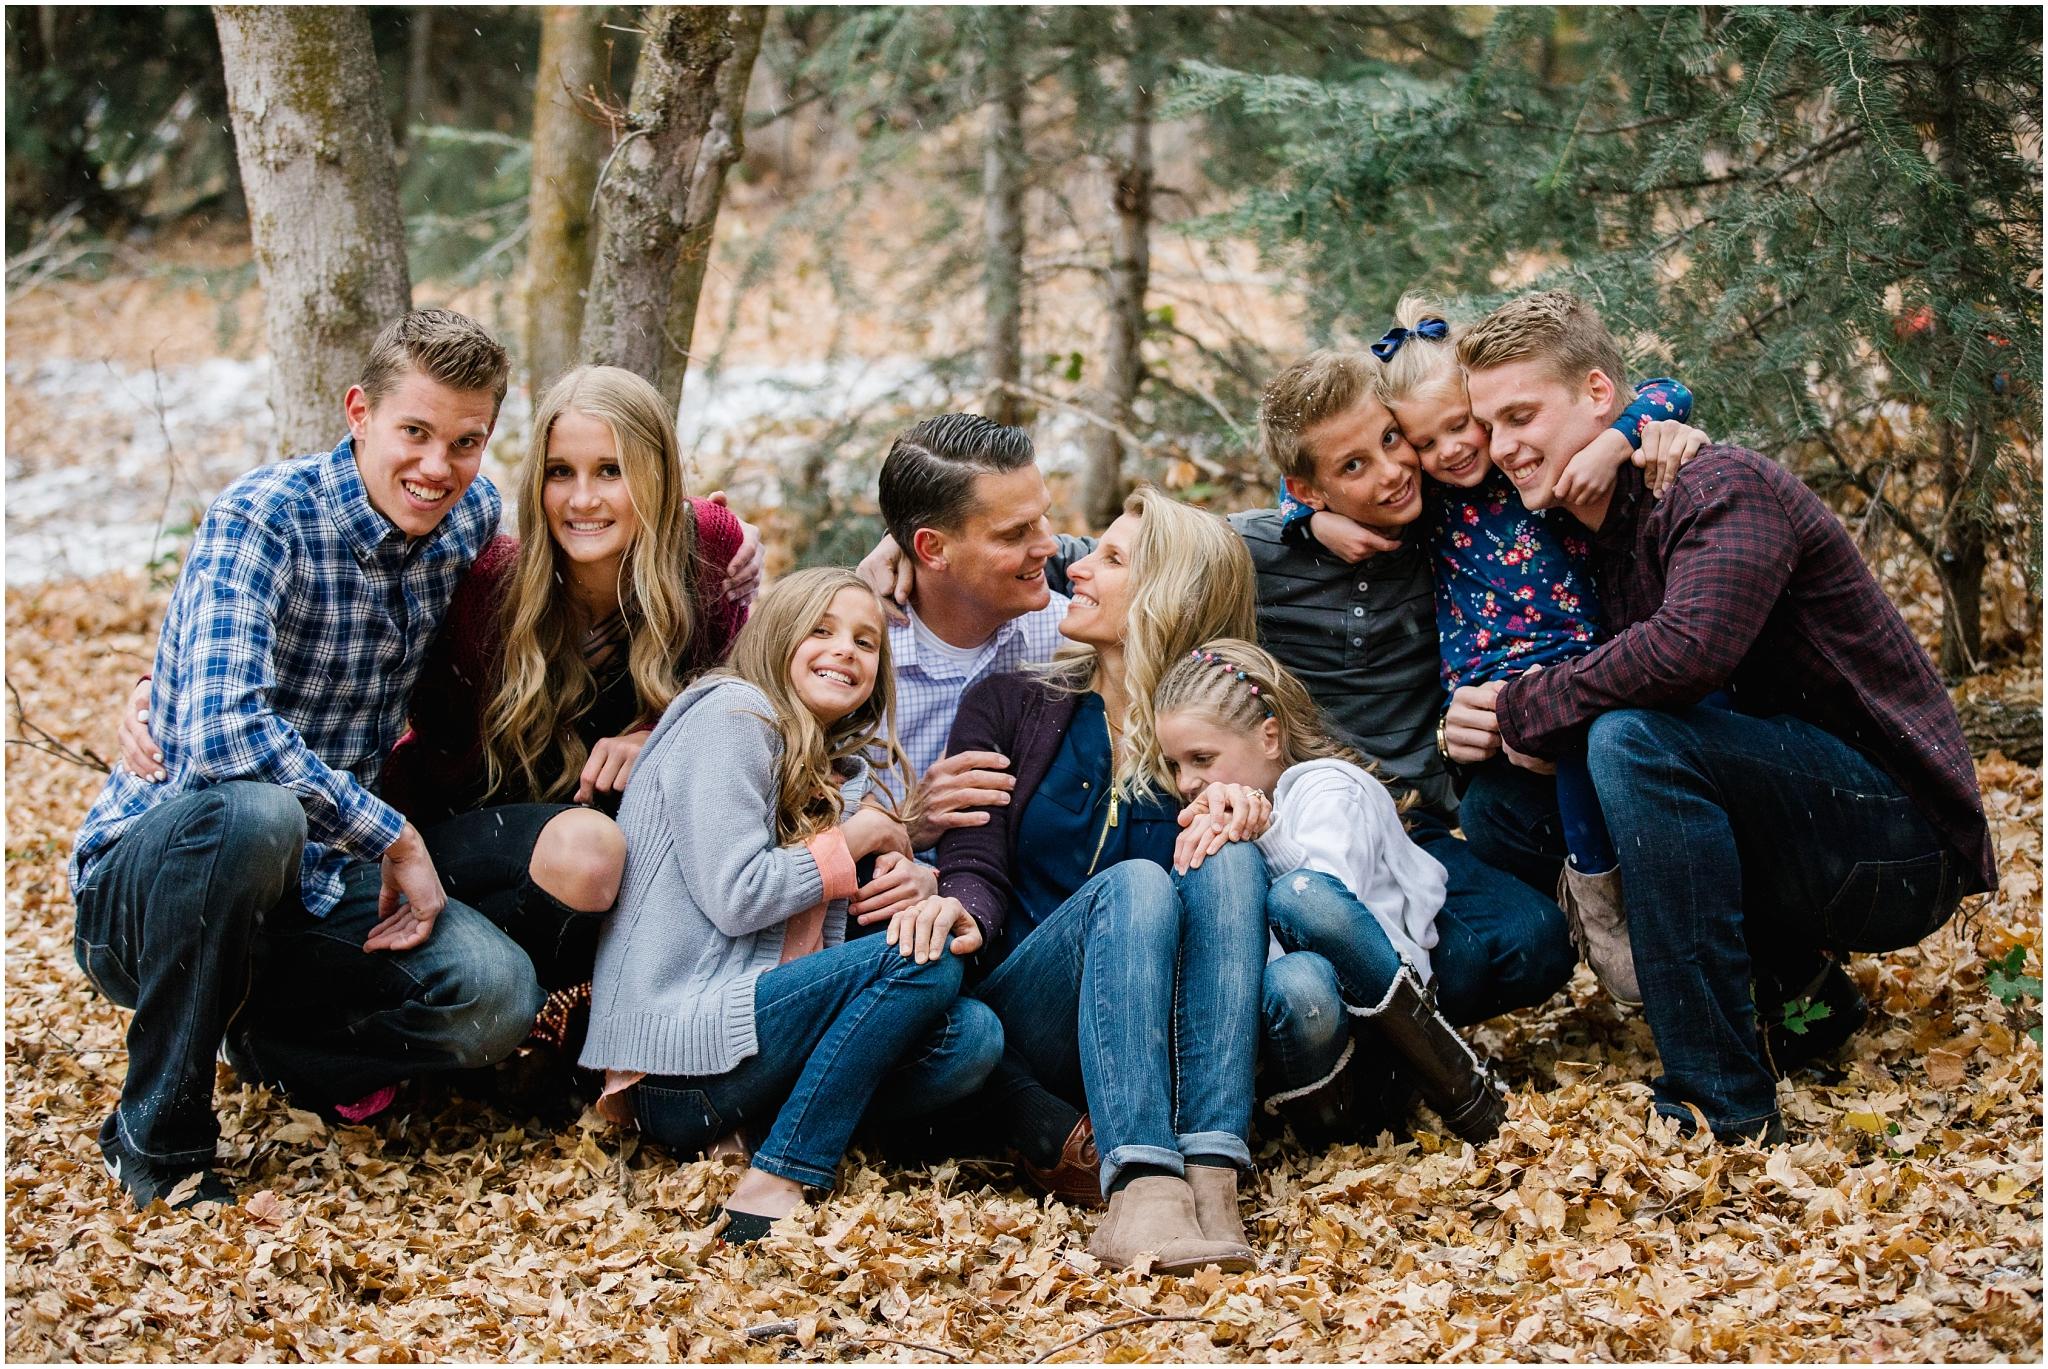 Vance-9_Lizzie-B-Imagery-Utah-Family-Photographer-Salt-Lake-City-Park-City-Utah-County-Payson-Canyon.jpg